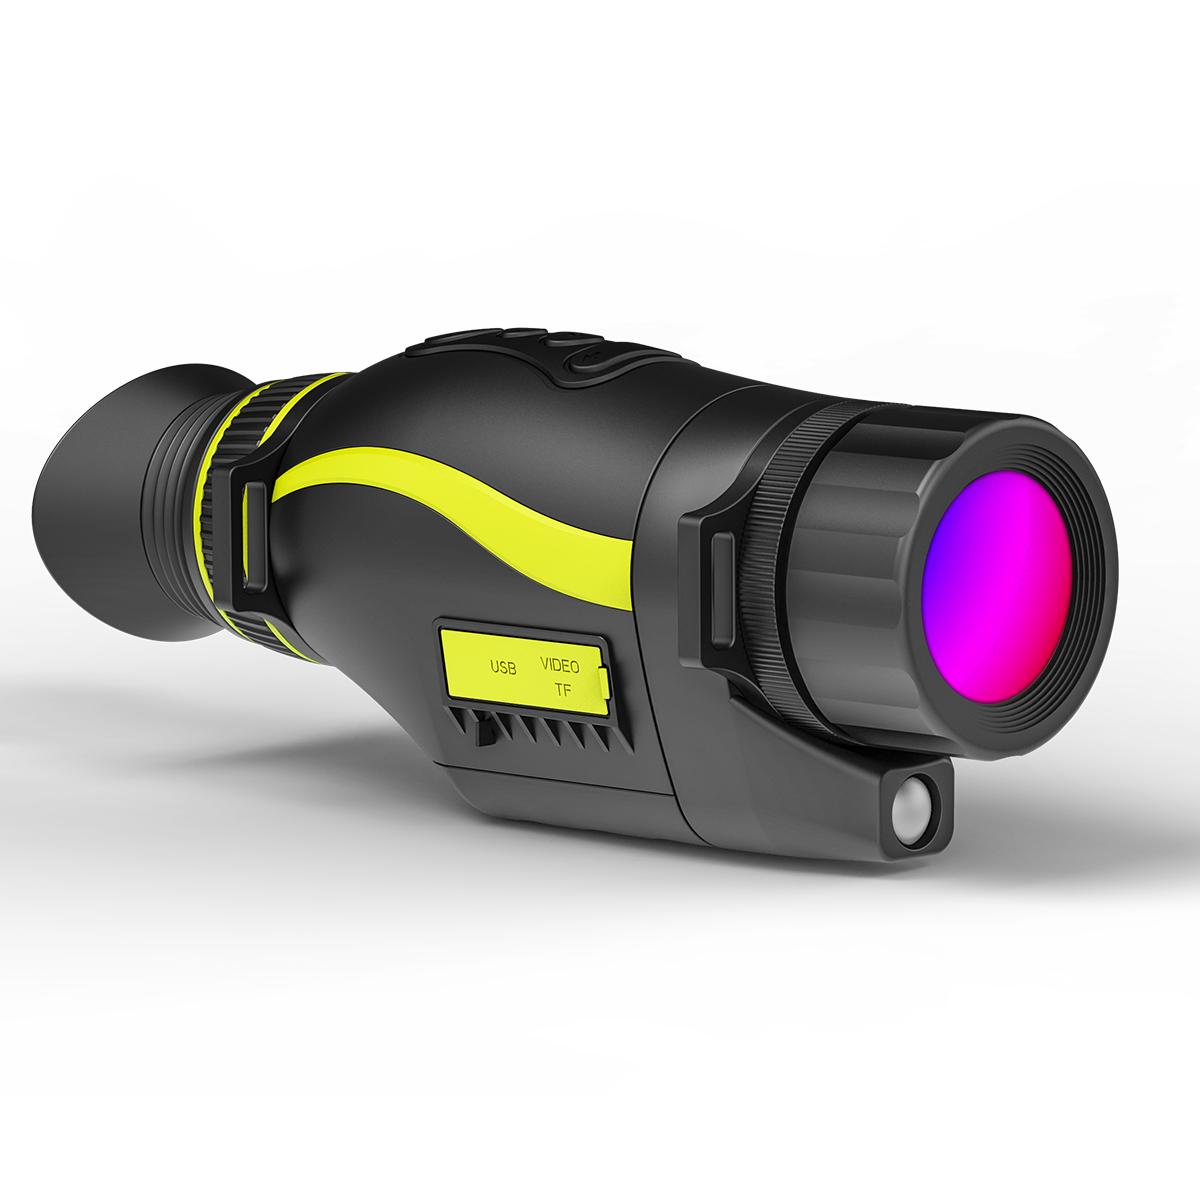 SUNCORE舜光NV0435数码夜视仪红外夜视高清可充电录像夜视望远镜